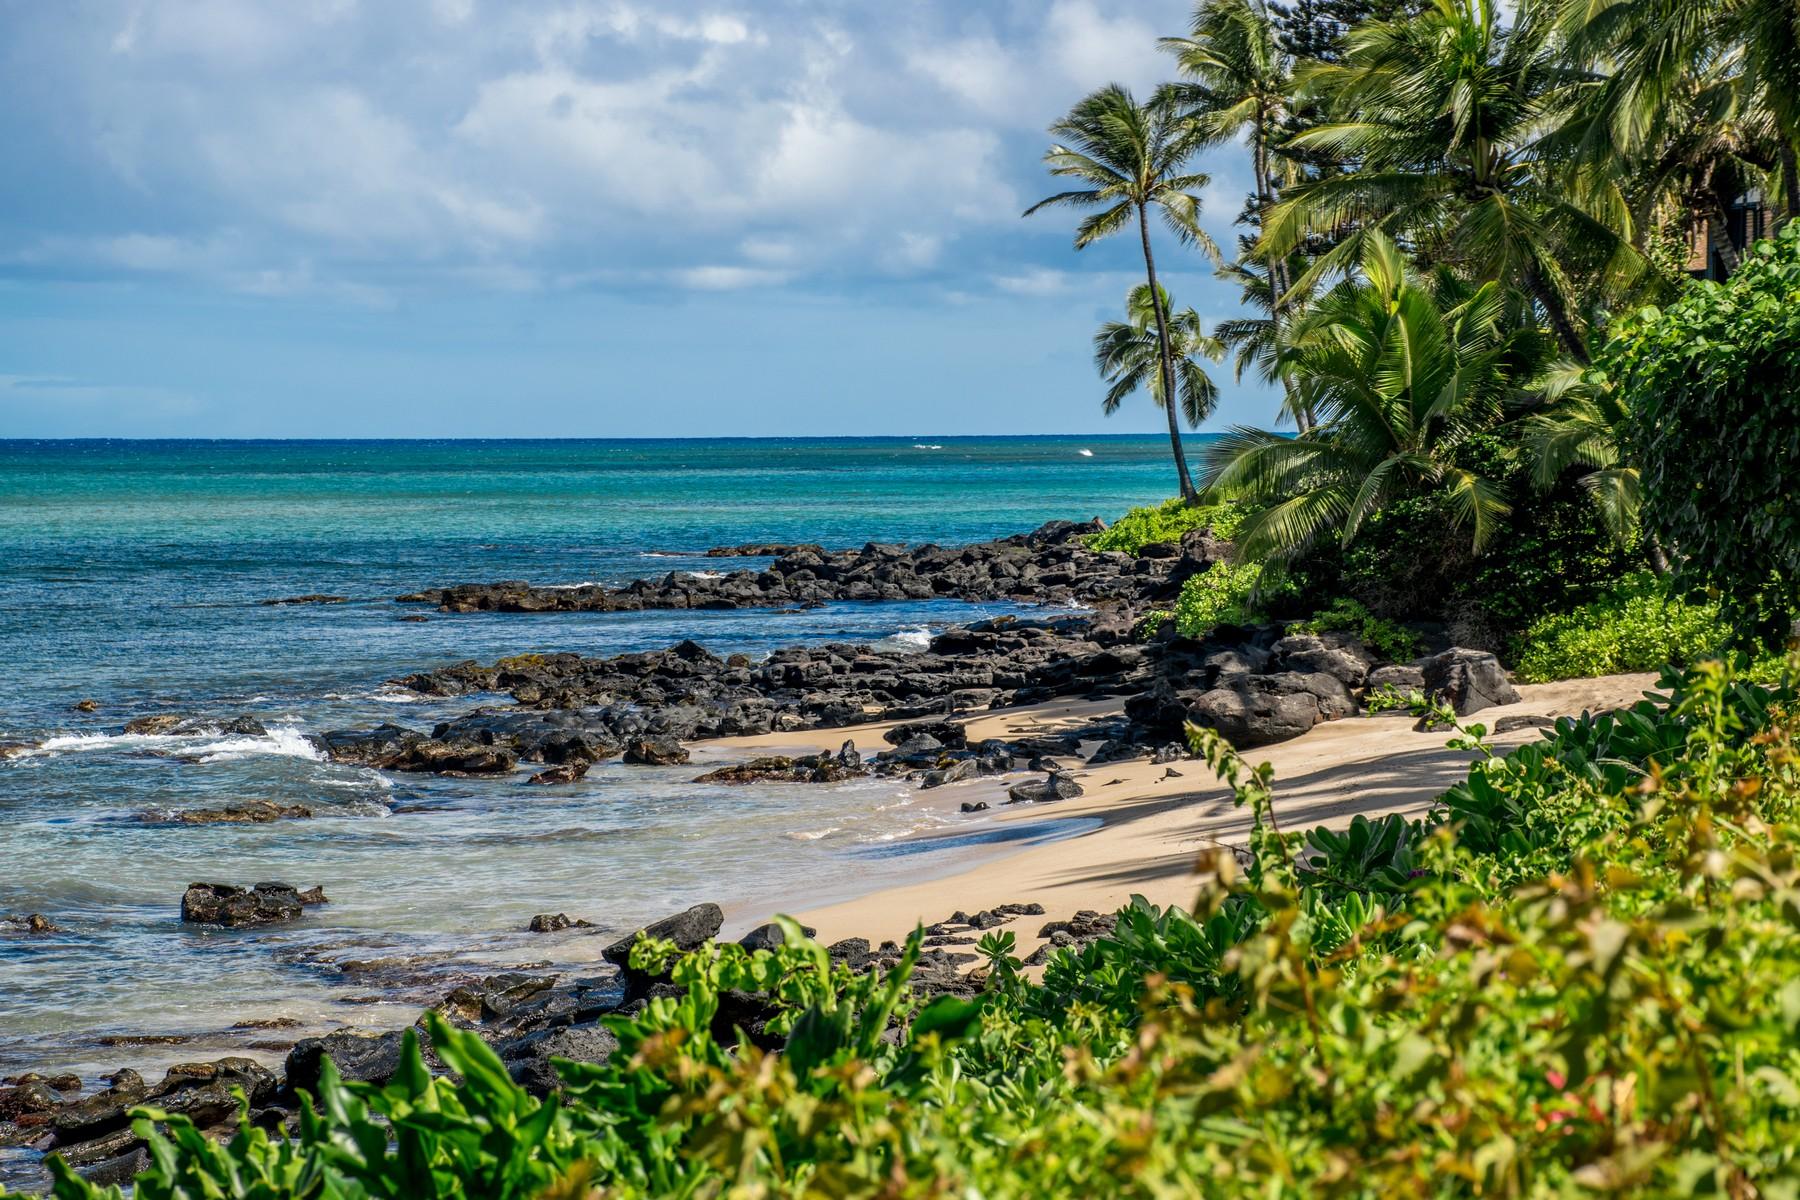 Copropriété pour l Vente à Residential Resort Living 4007 Lower Honoapiilani Road, Mahinahina Beach 113 Lahaina, Hawaii, 96761 États-Unis